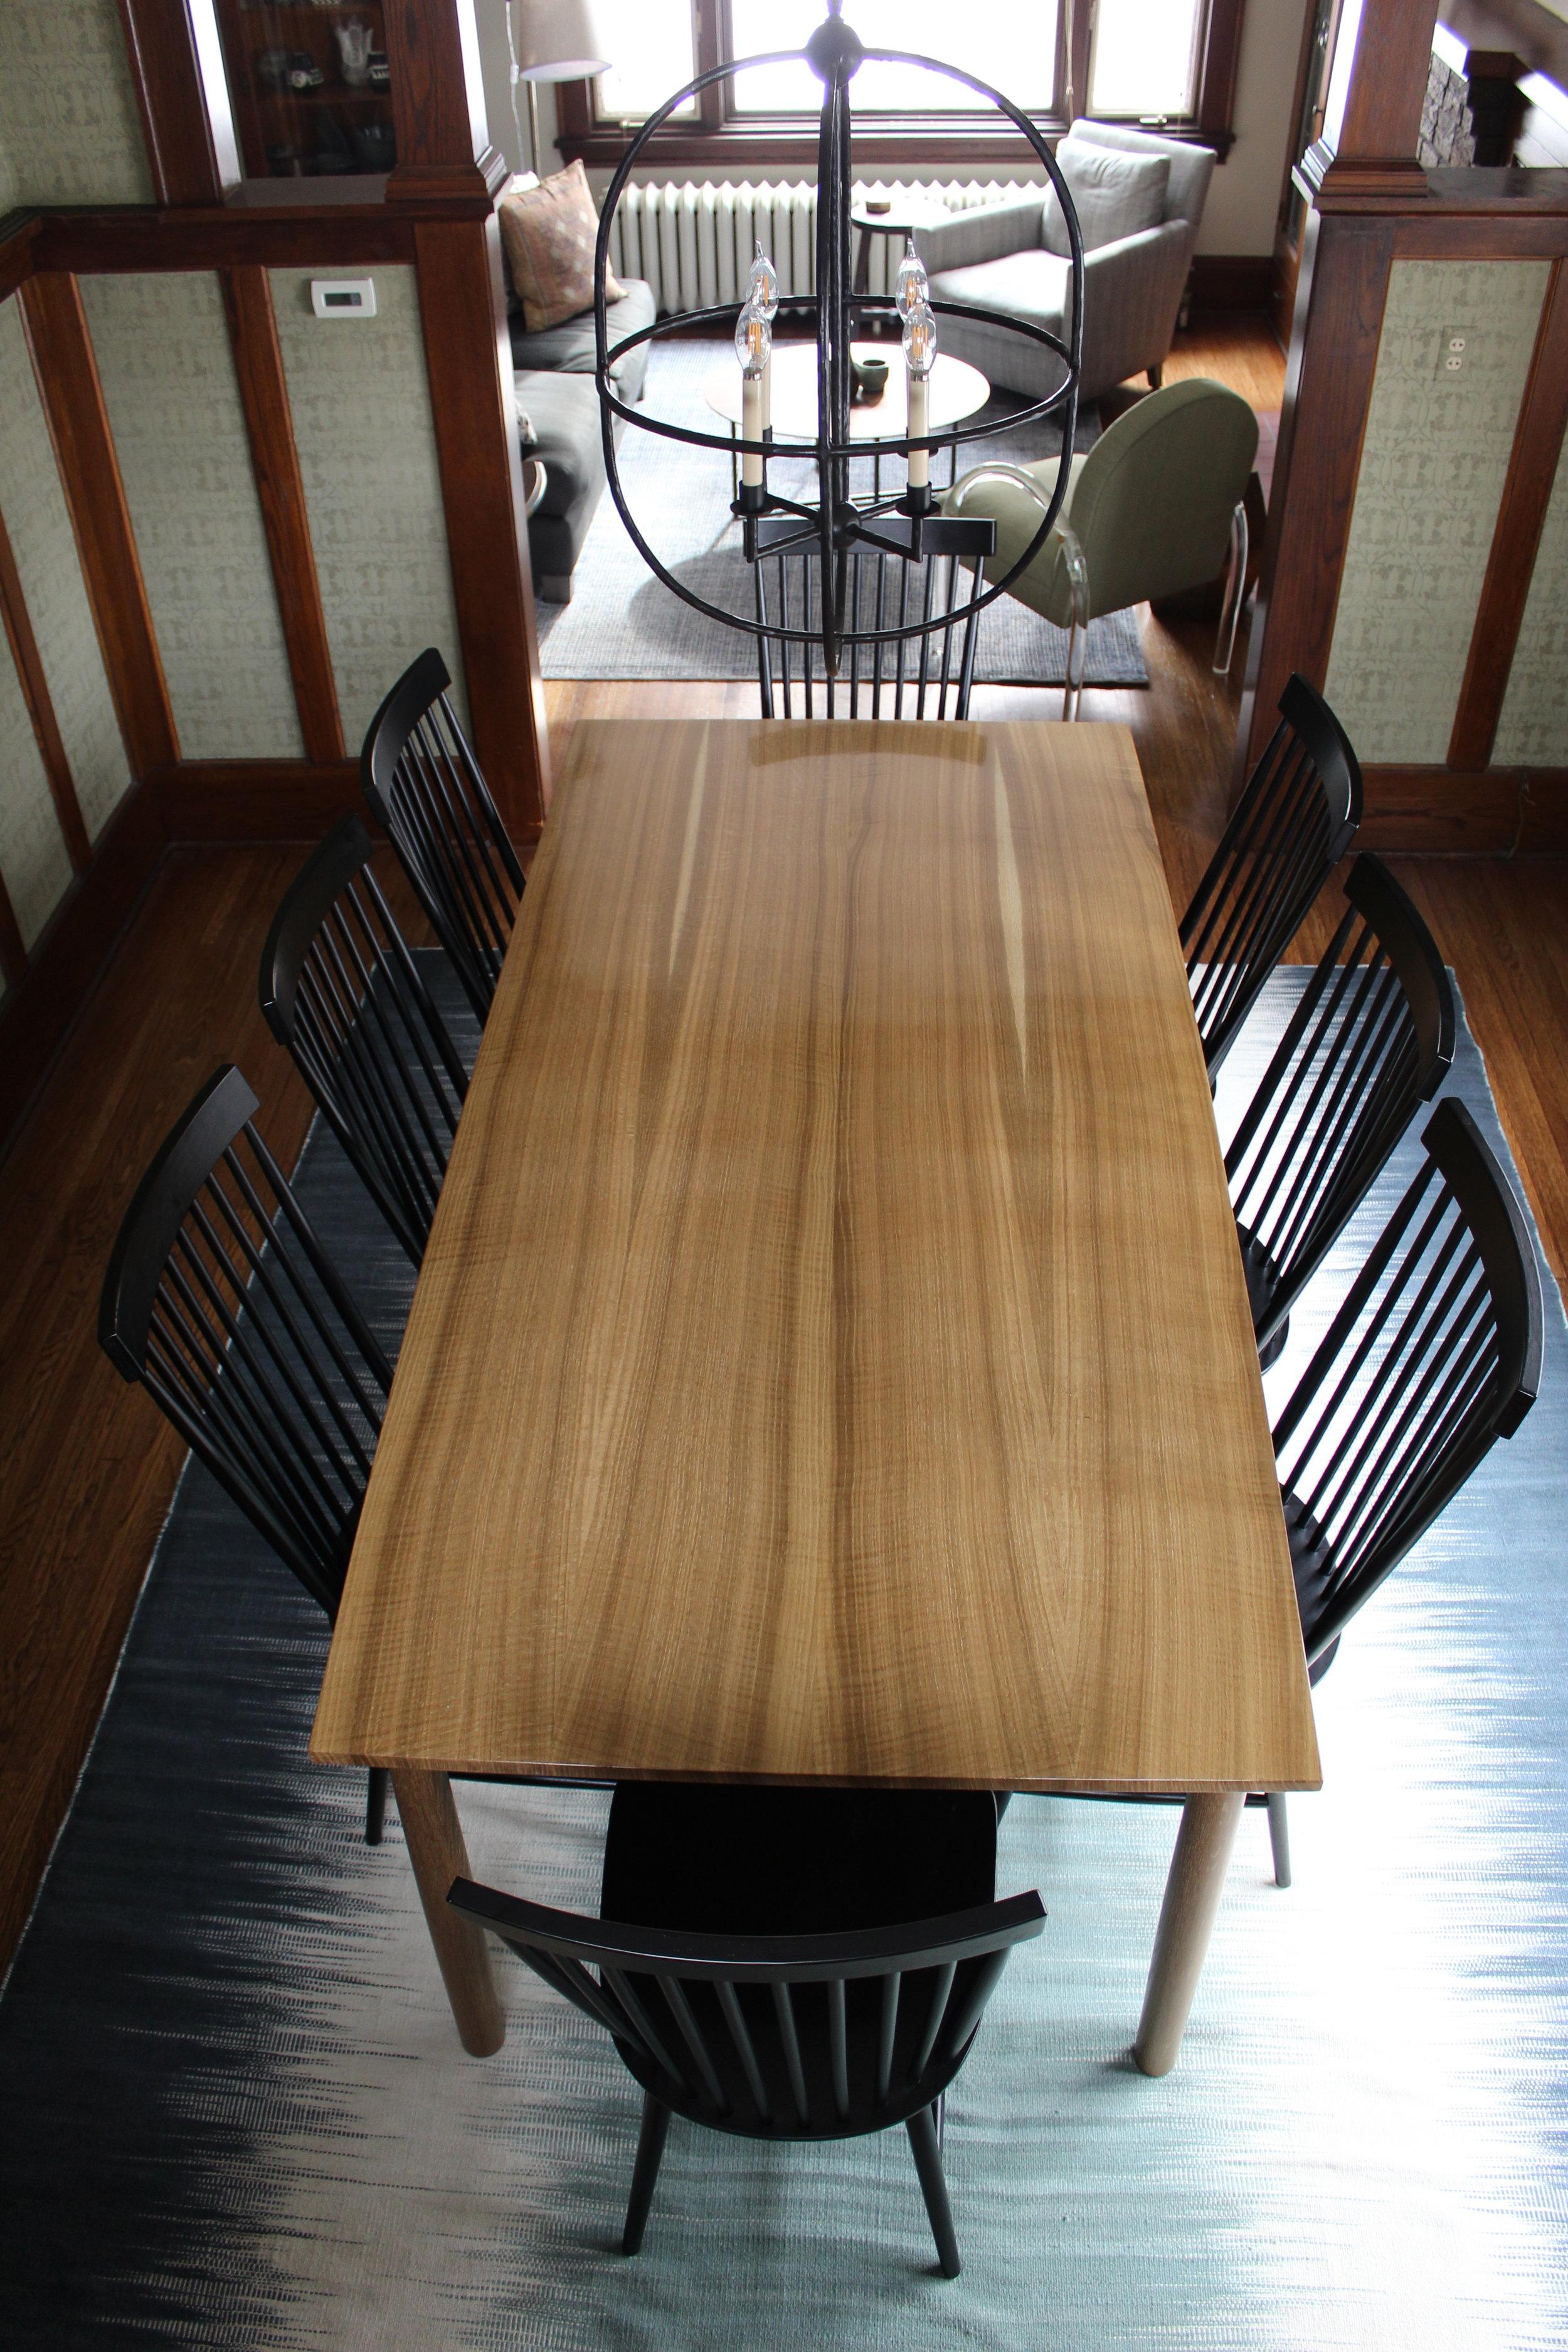 Fumed White Oak Dining Table